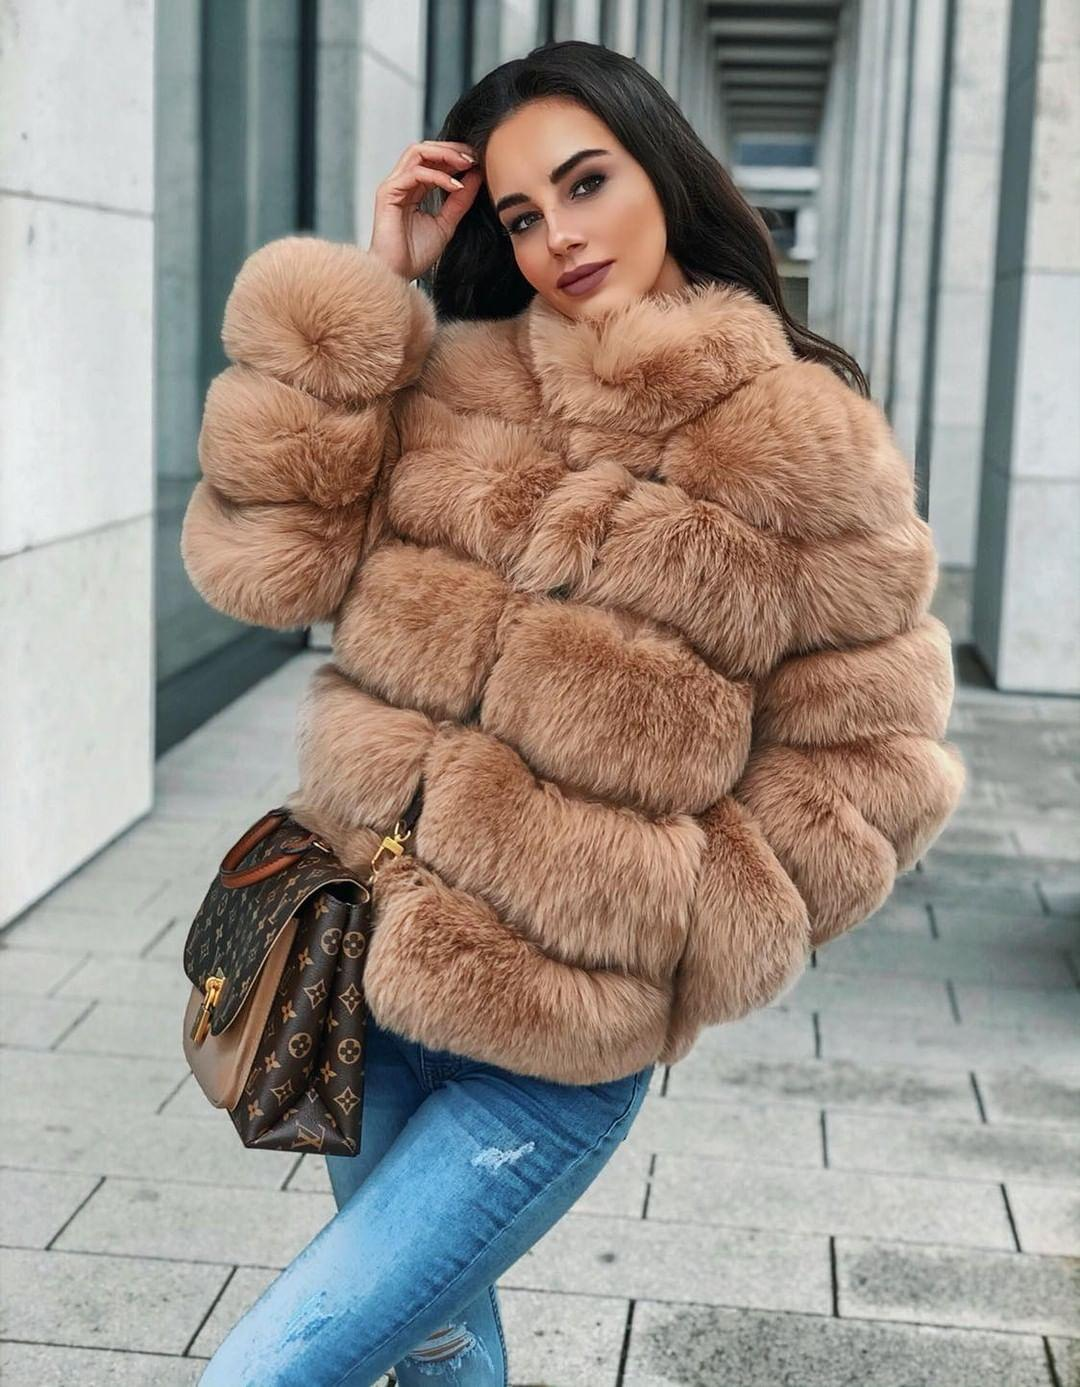 carla-camel-veronika_klimovits-4